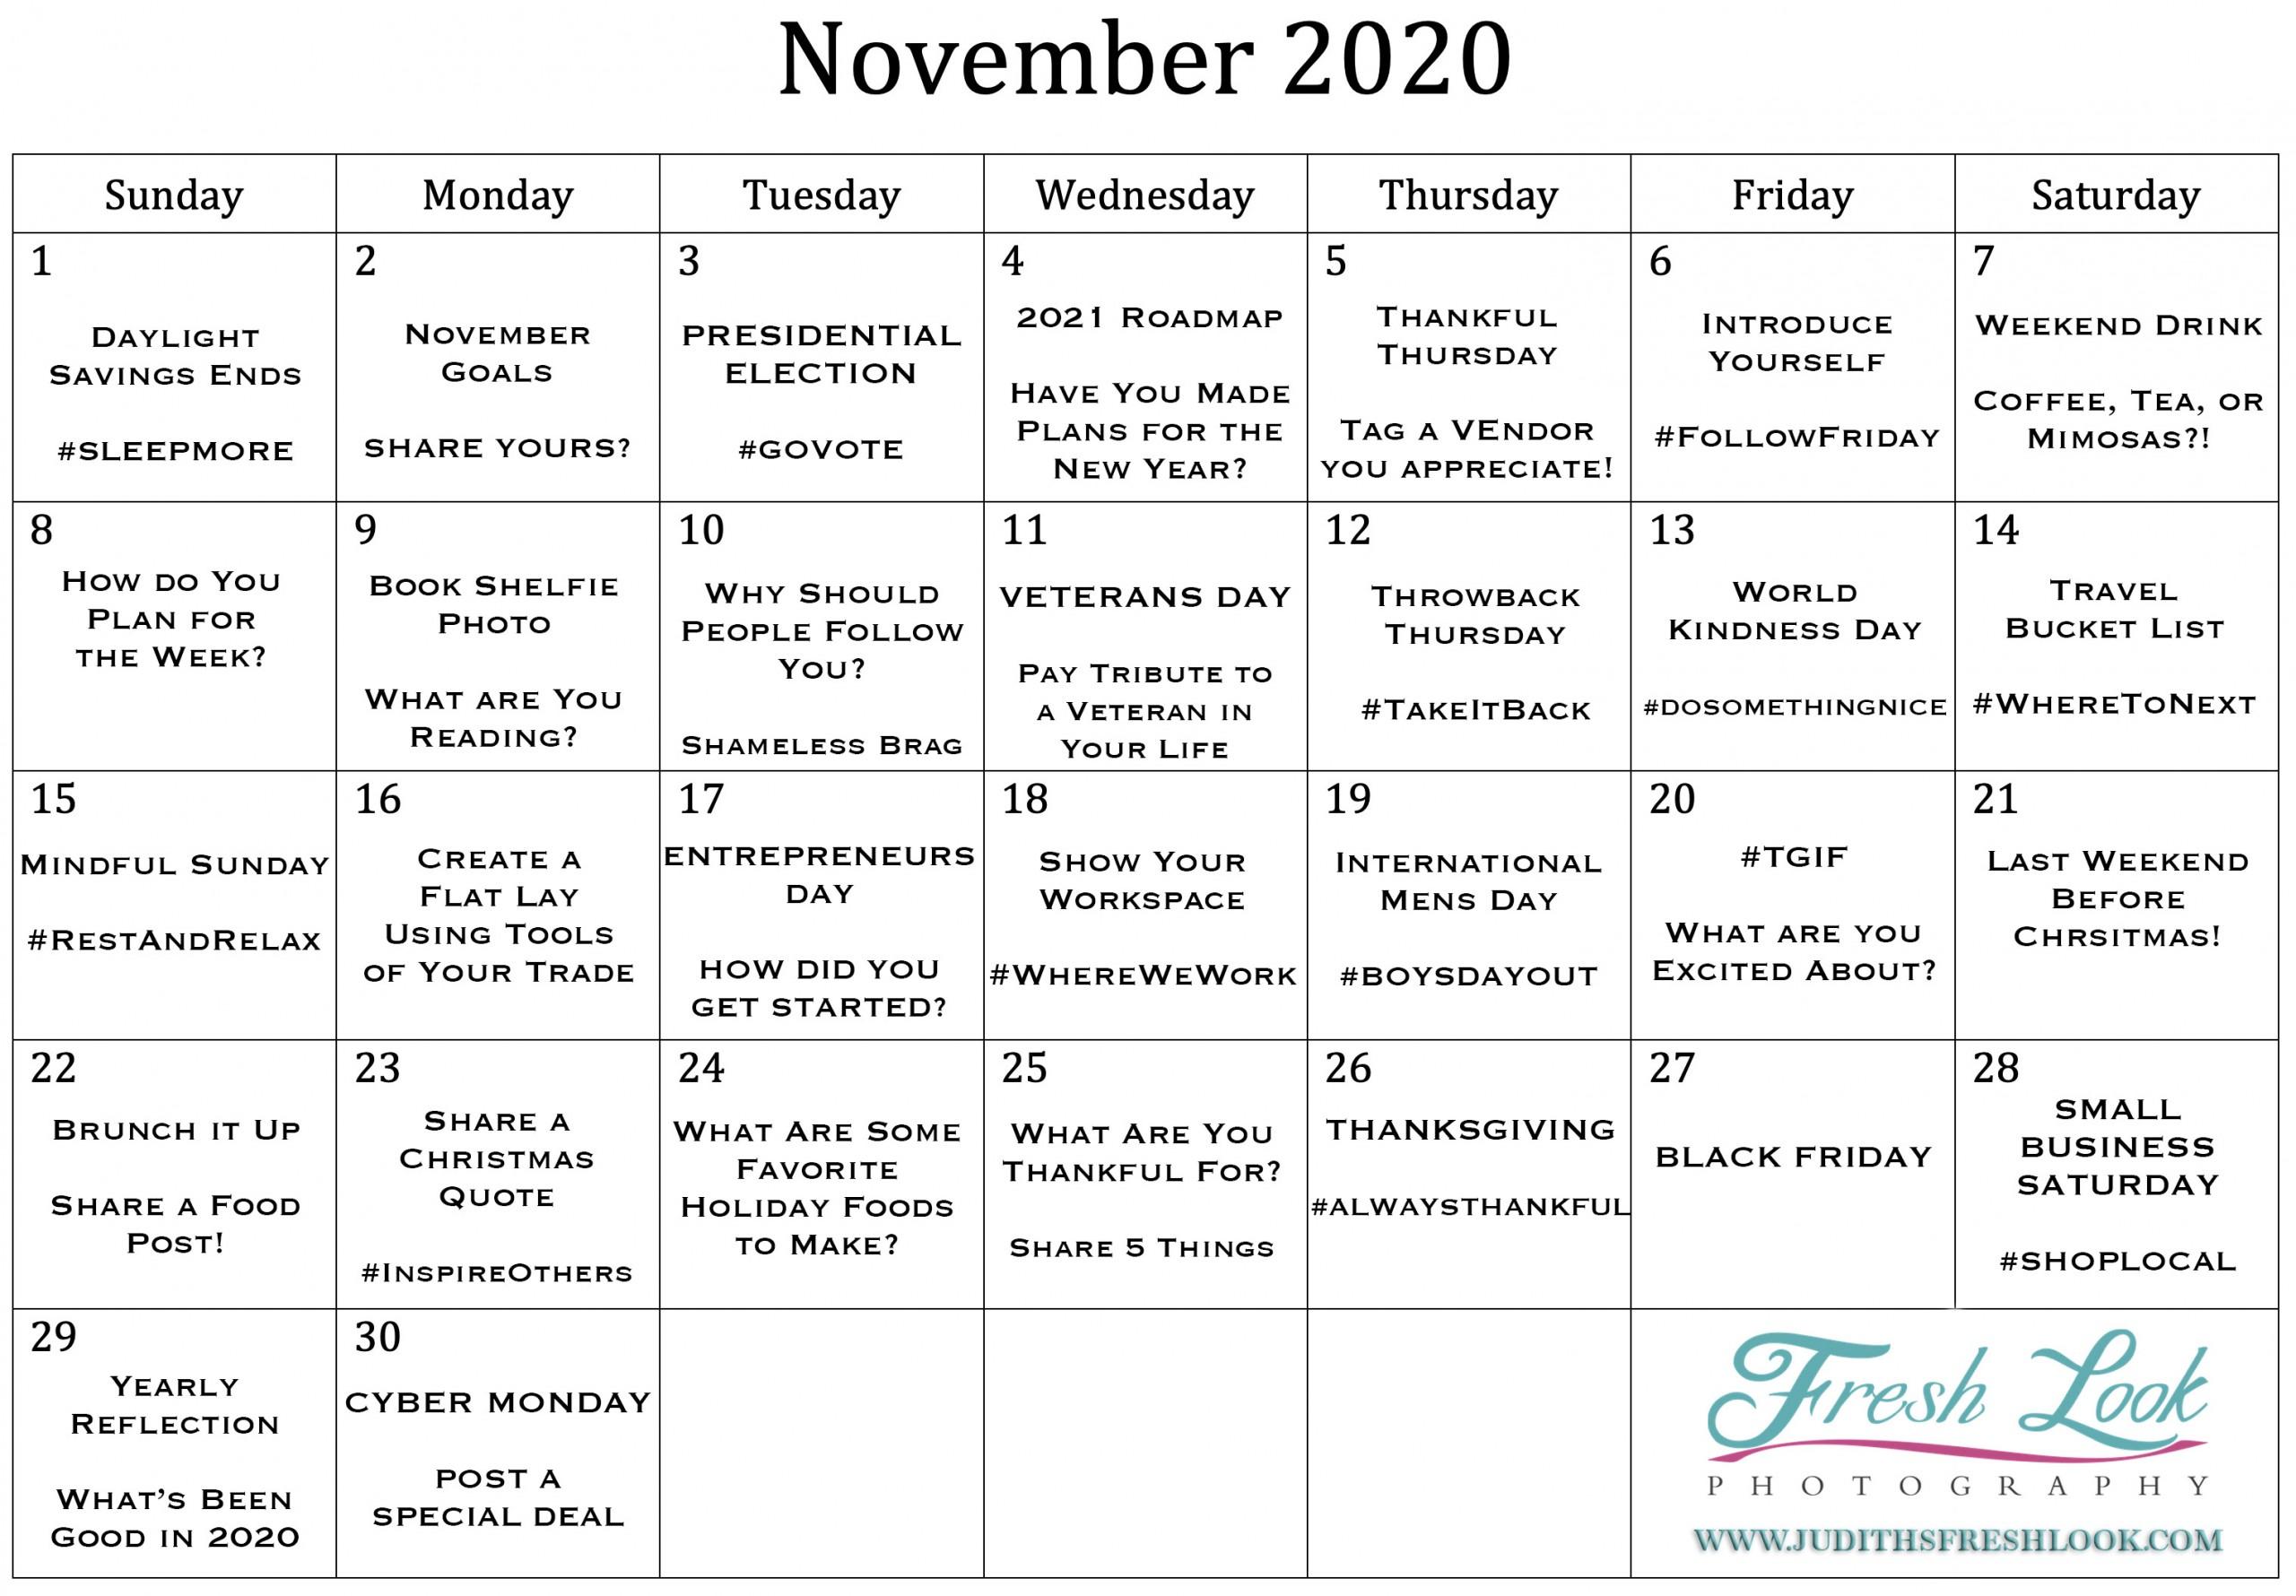 November 2020 Goals Social Media Calendar